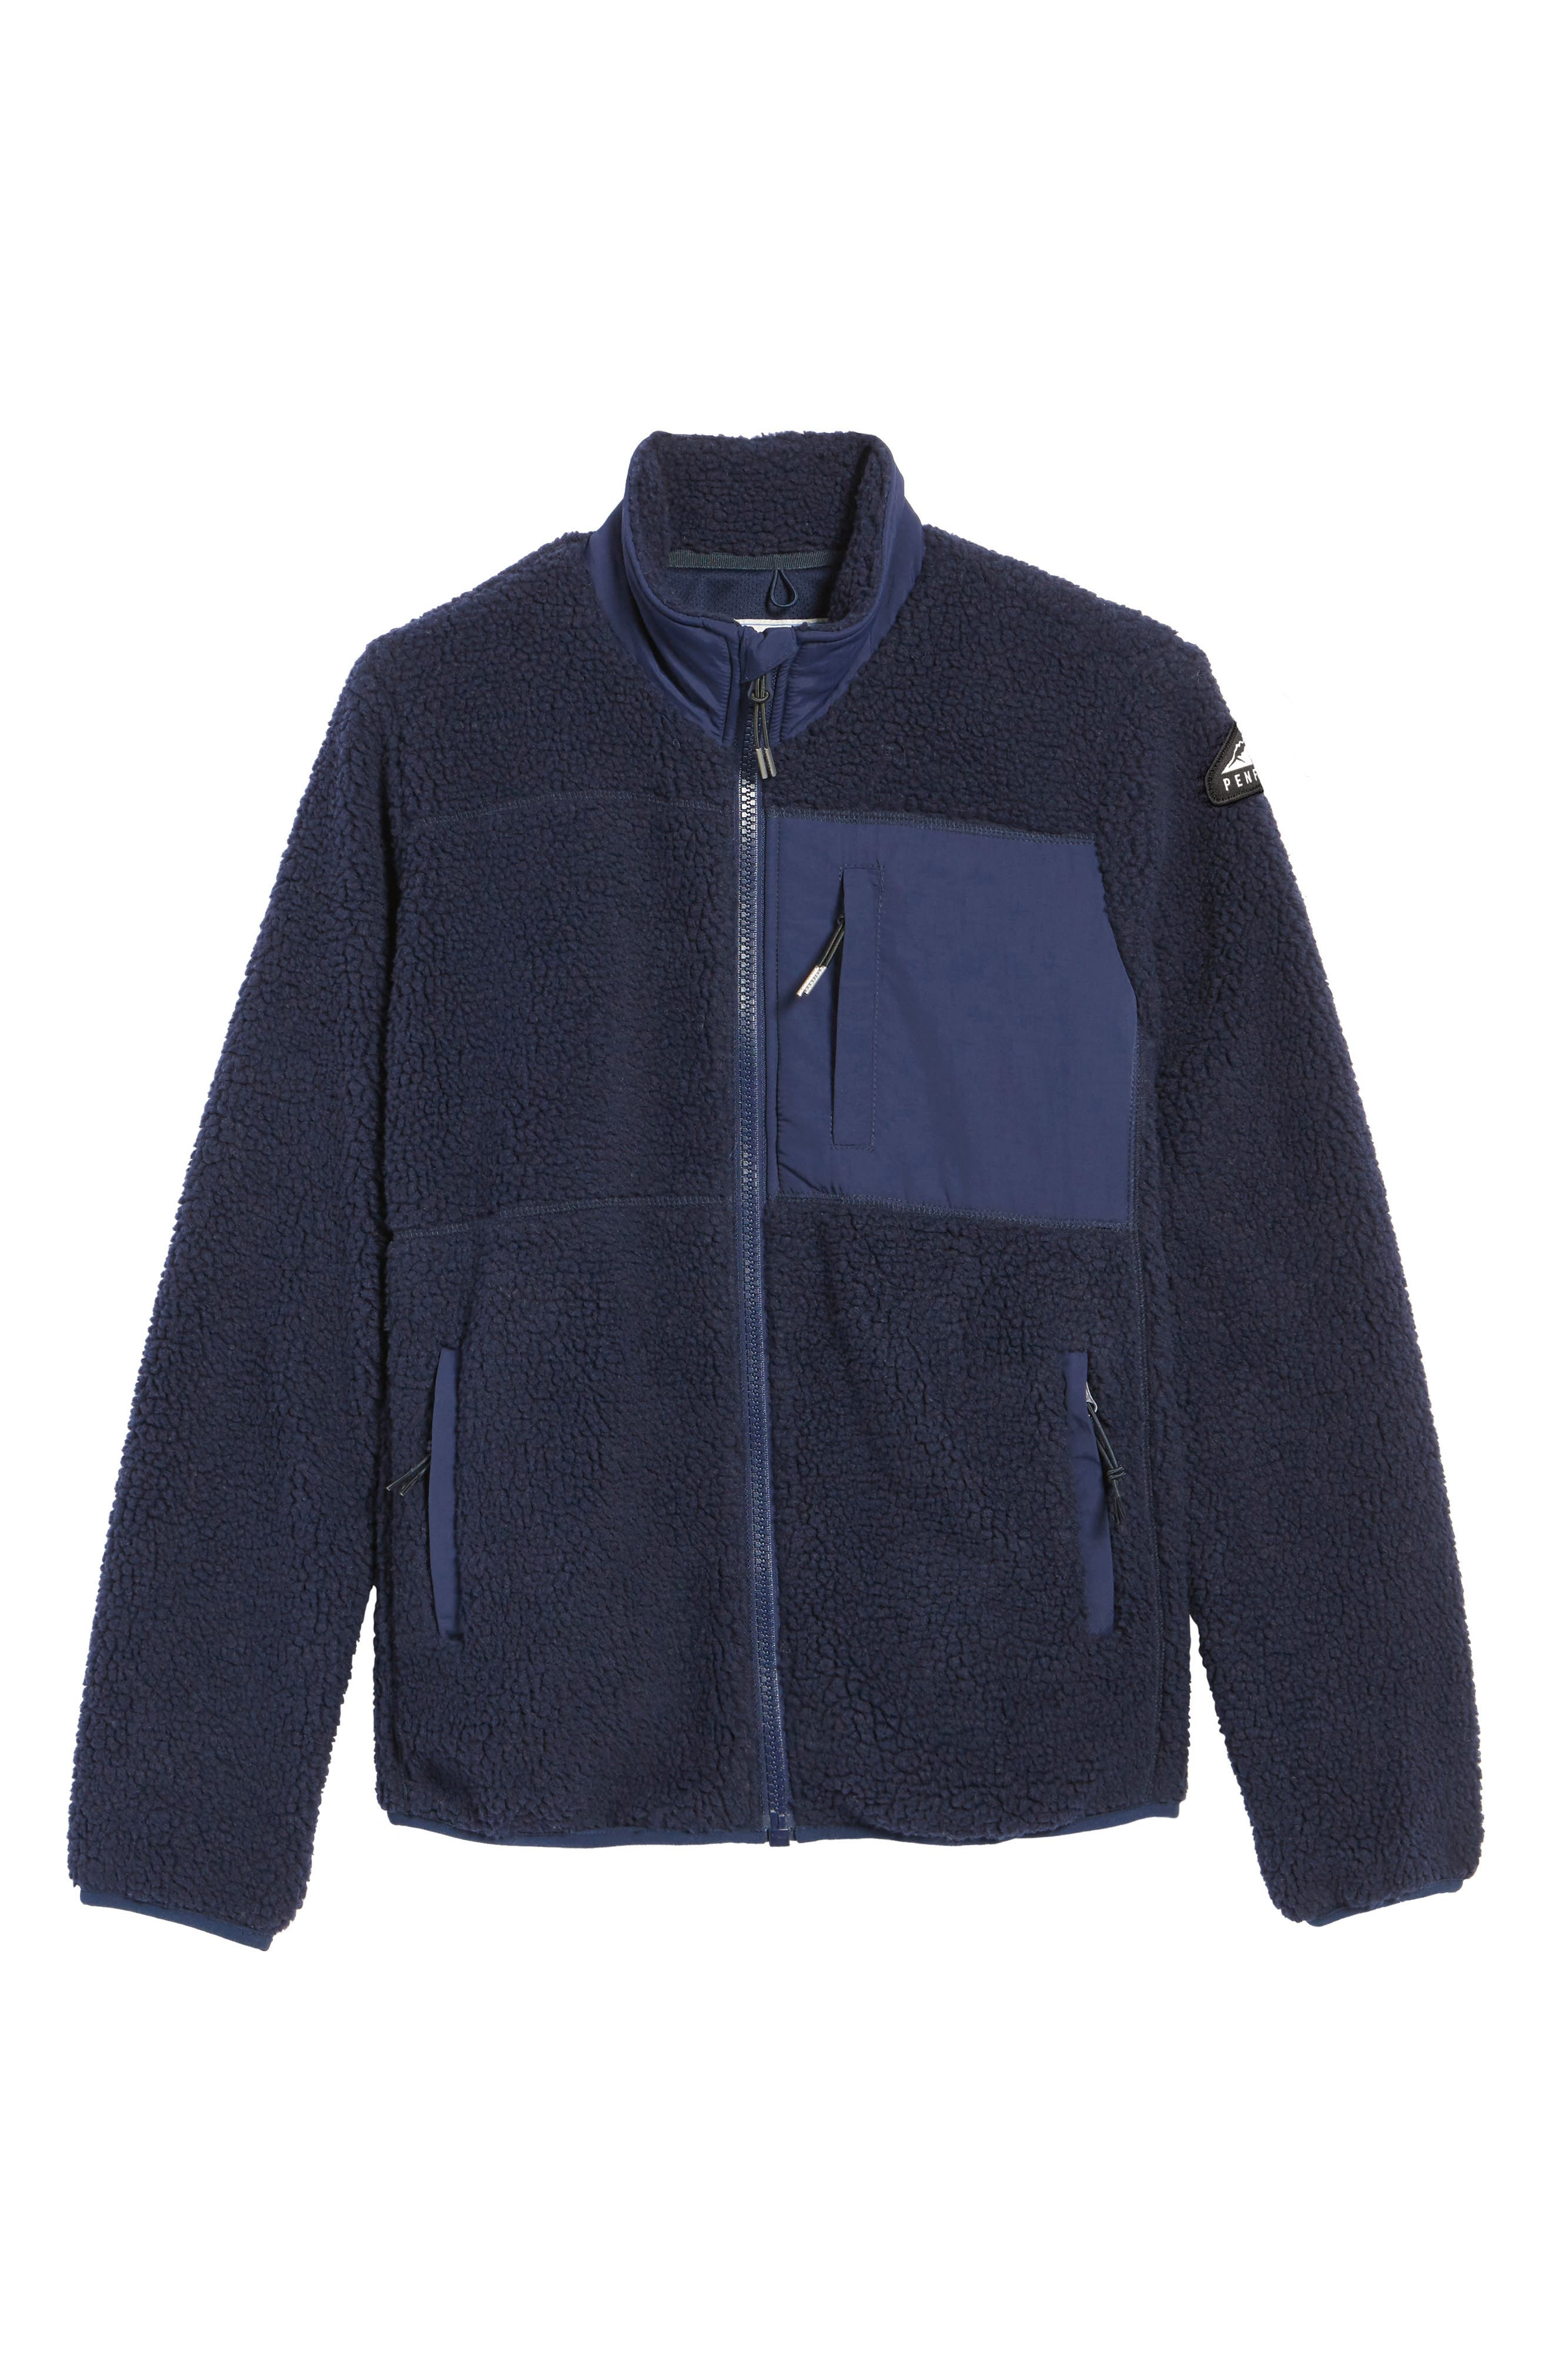 Mattawa Fleece Jacket,                             Alternate thumbnail 10, color,